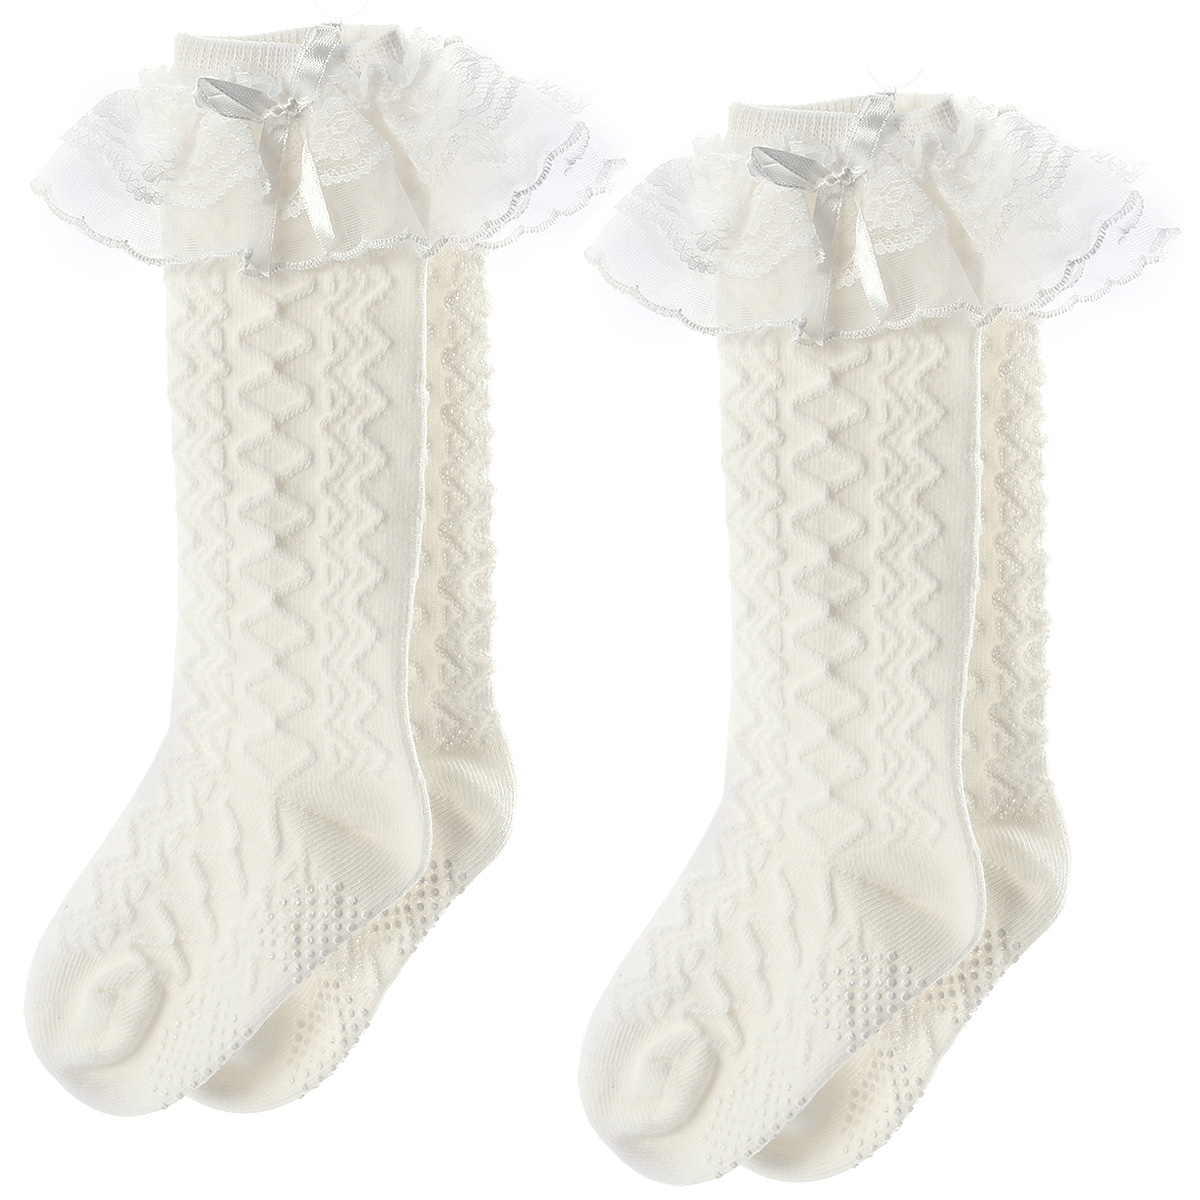 2x Kid Toddler Knee High Socks Tights Baby Girl Leg Warmer